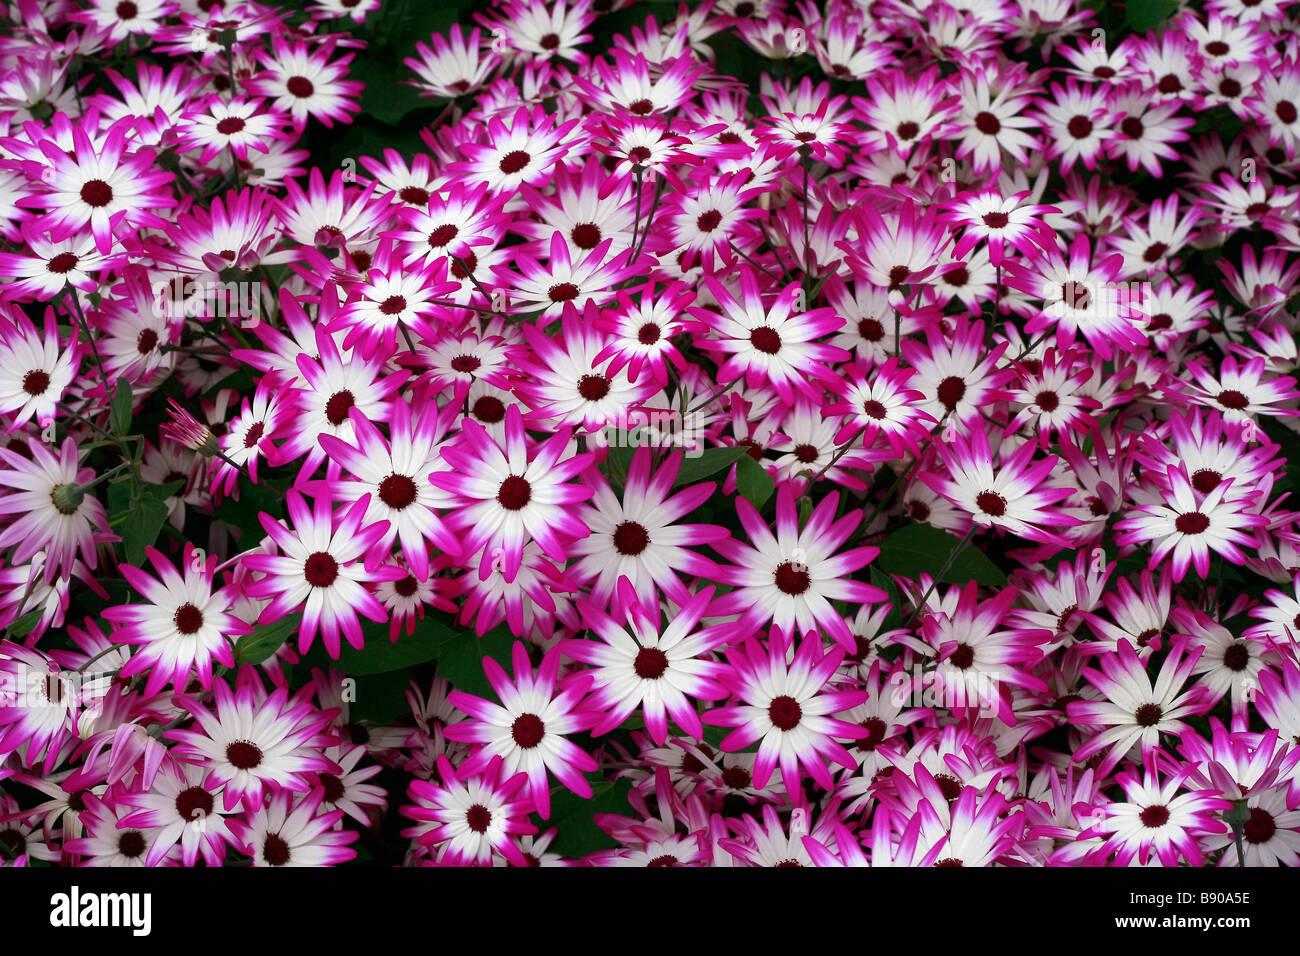 Pericallis hybrida Senetti - Stock Image